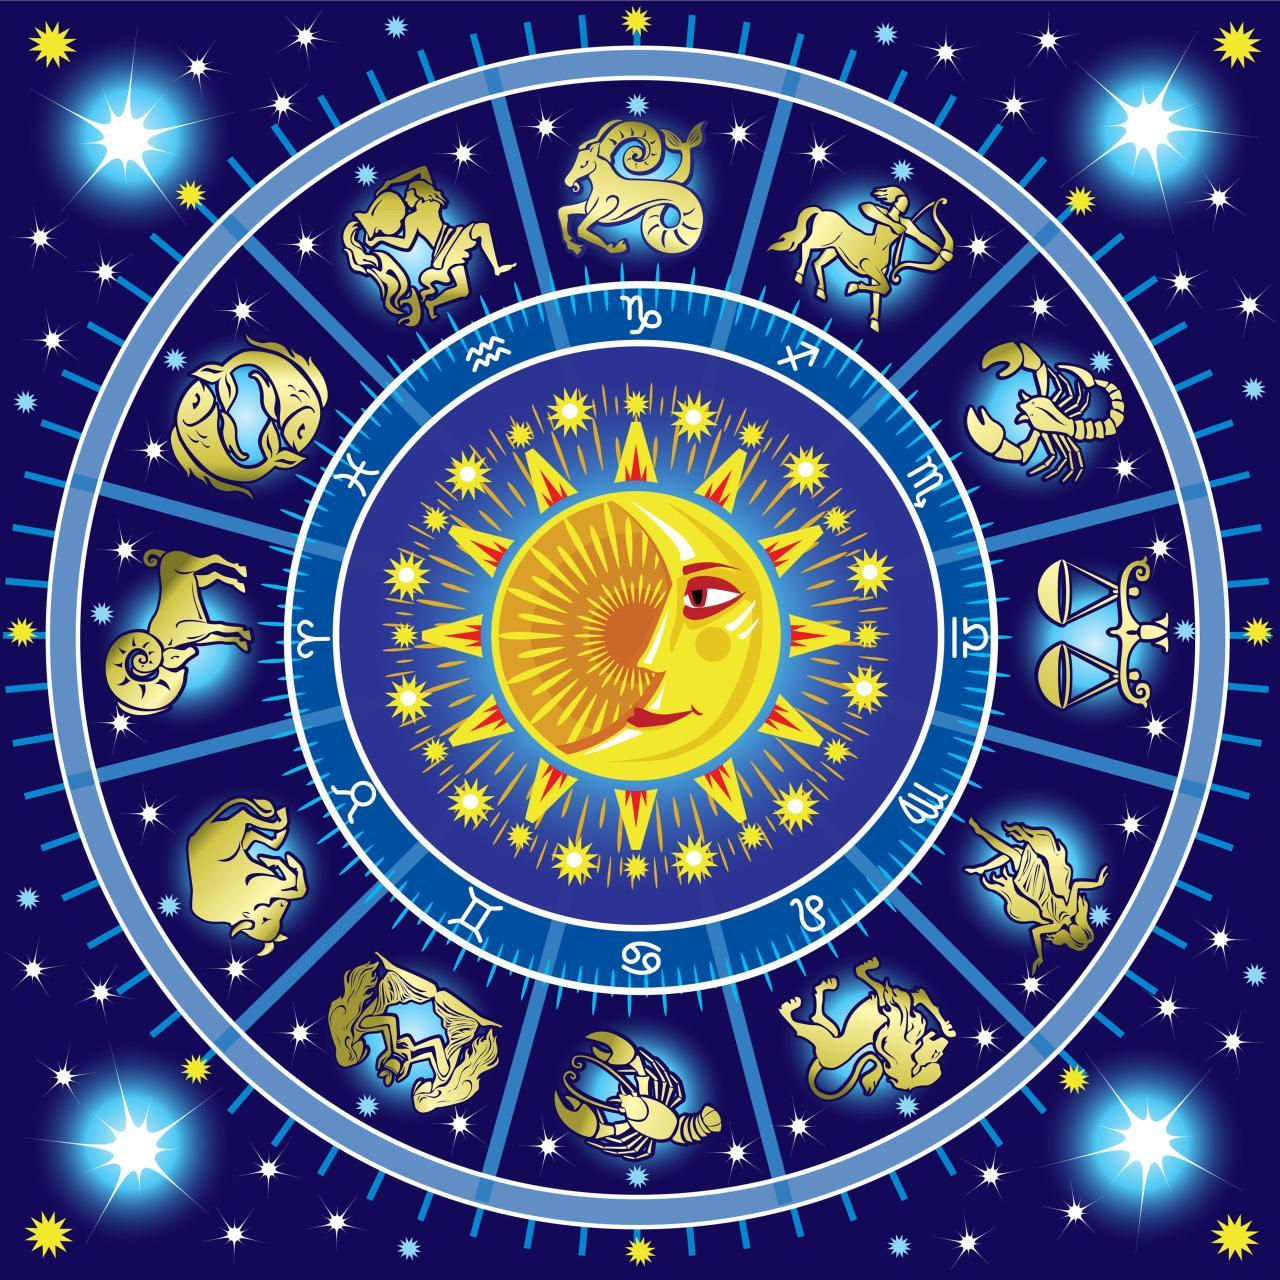 Как лгут разные Знаки Зодиака.